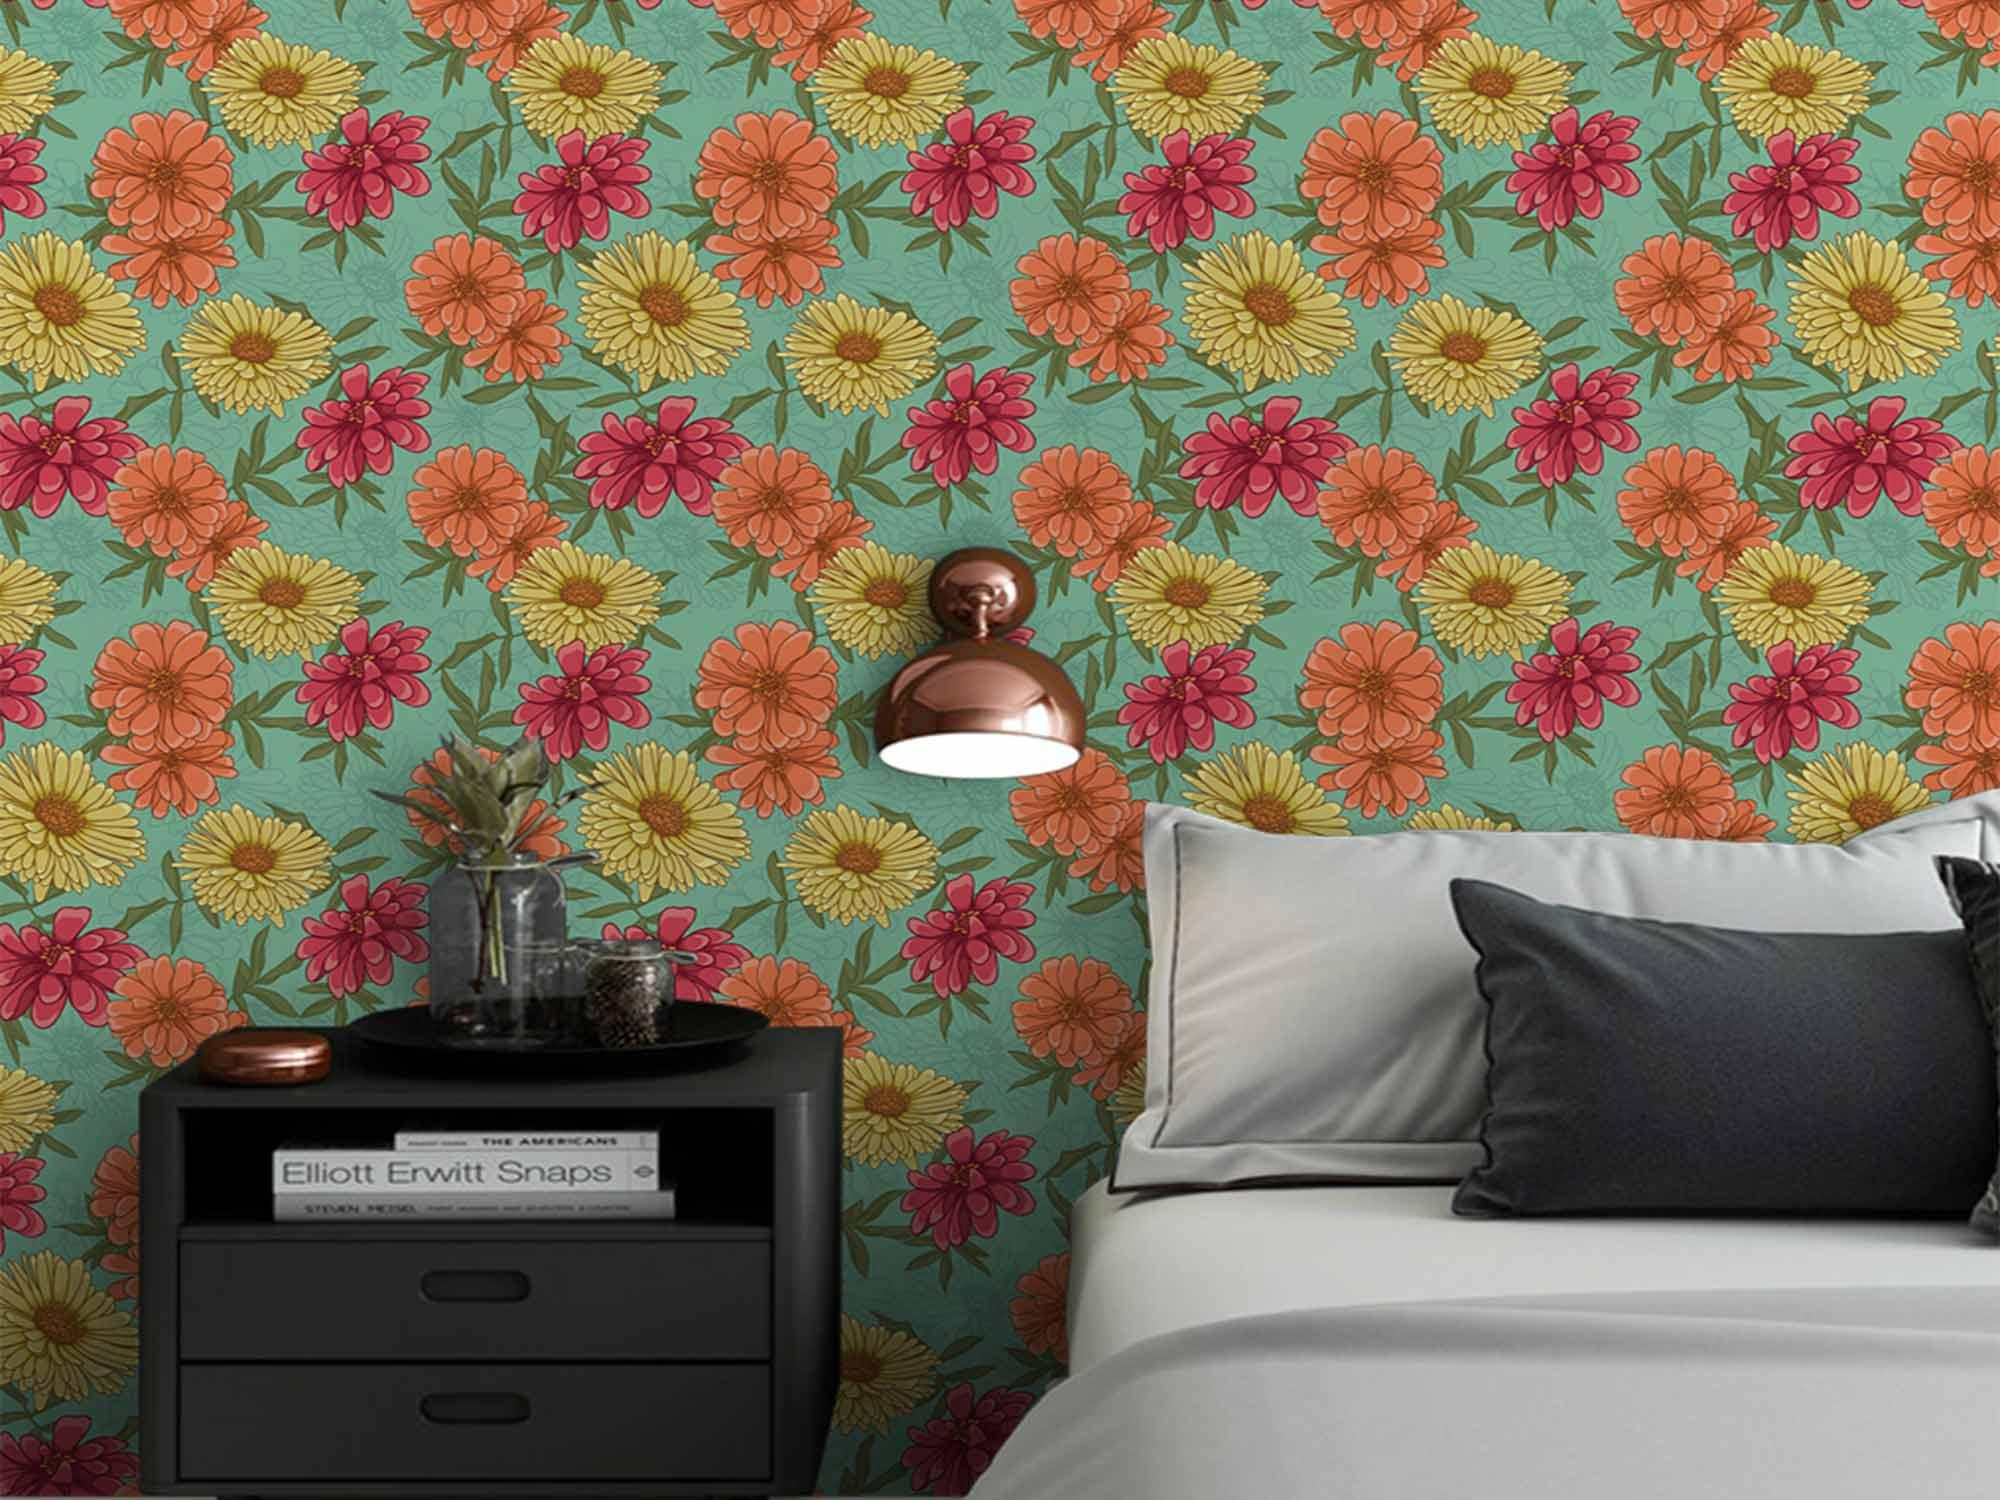 Papel de Parede Floral 0055 - Adesivos de Parede  - Paredes Decoradas